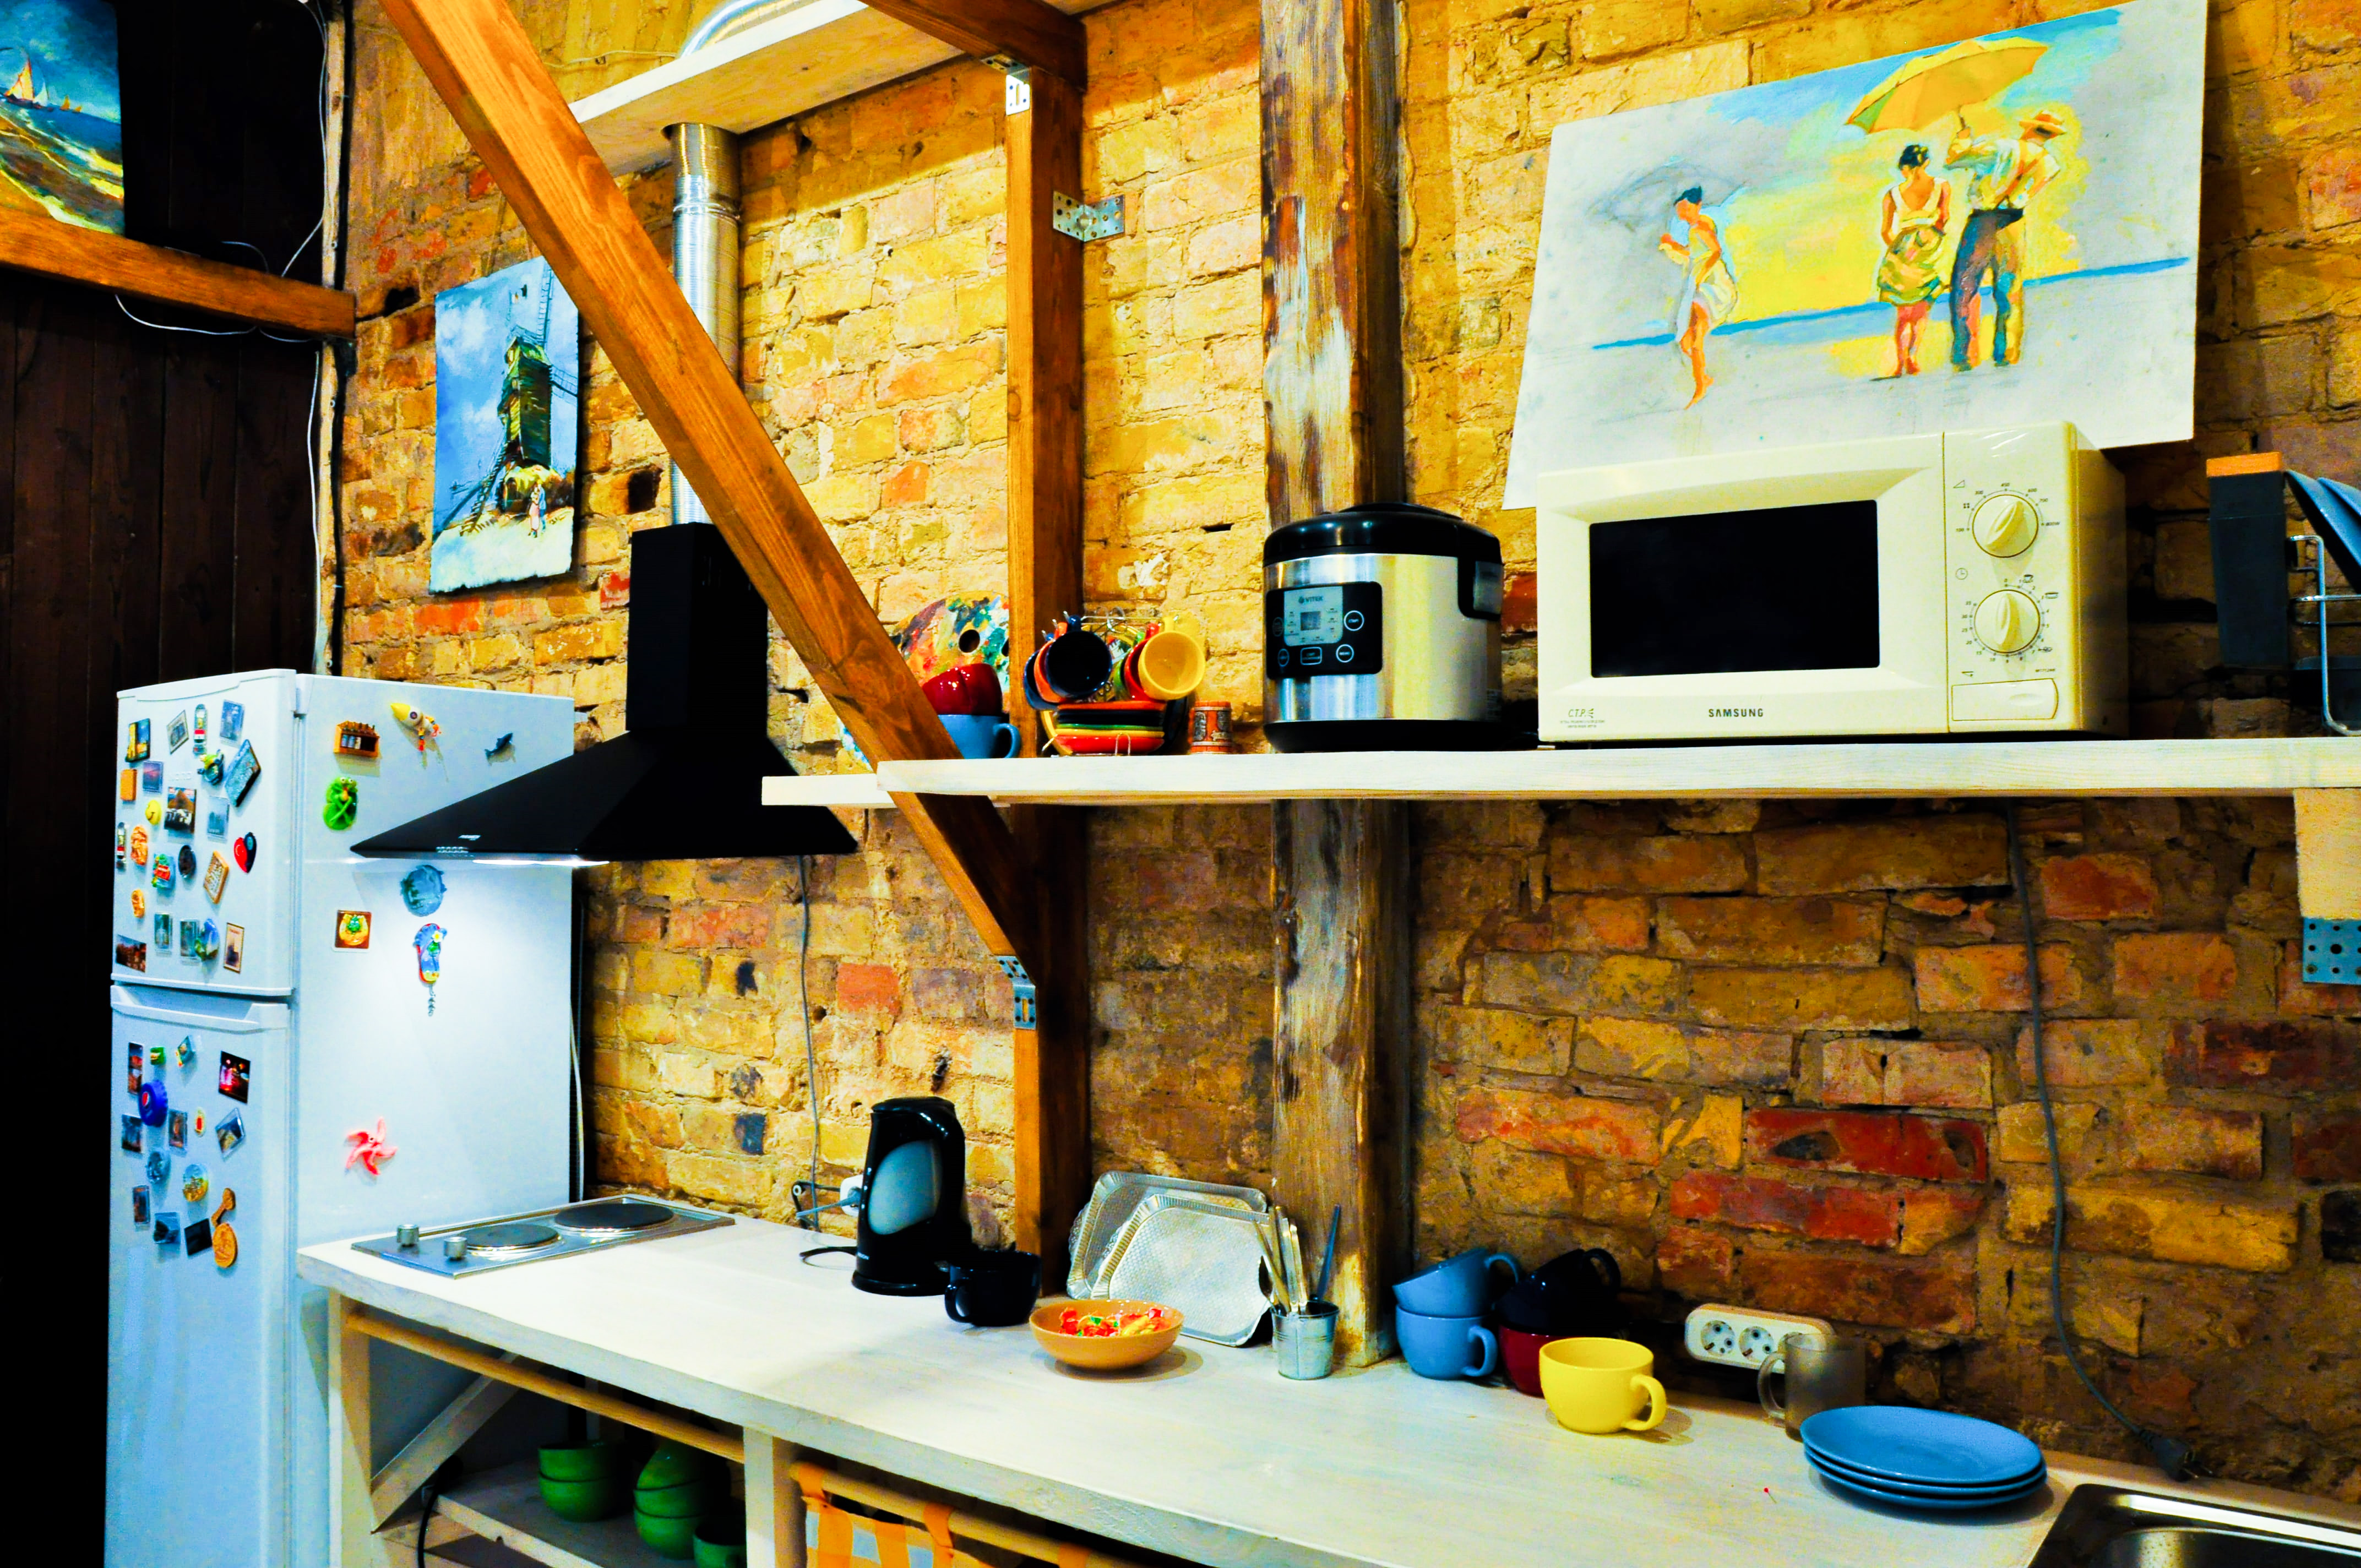 Кухня, облаштована усім необхідним